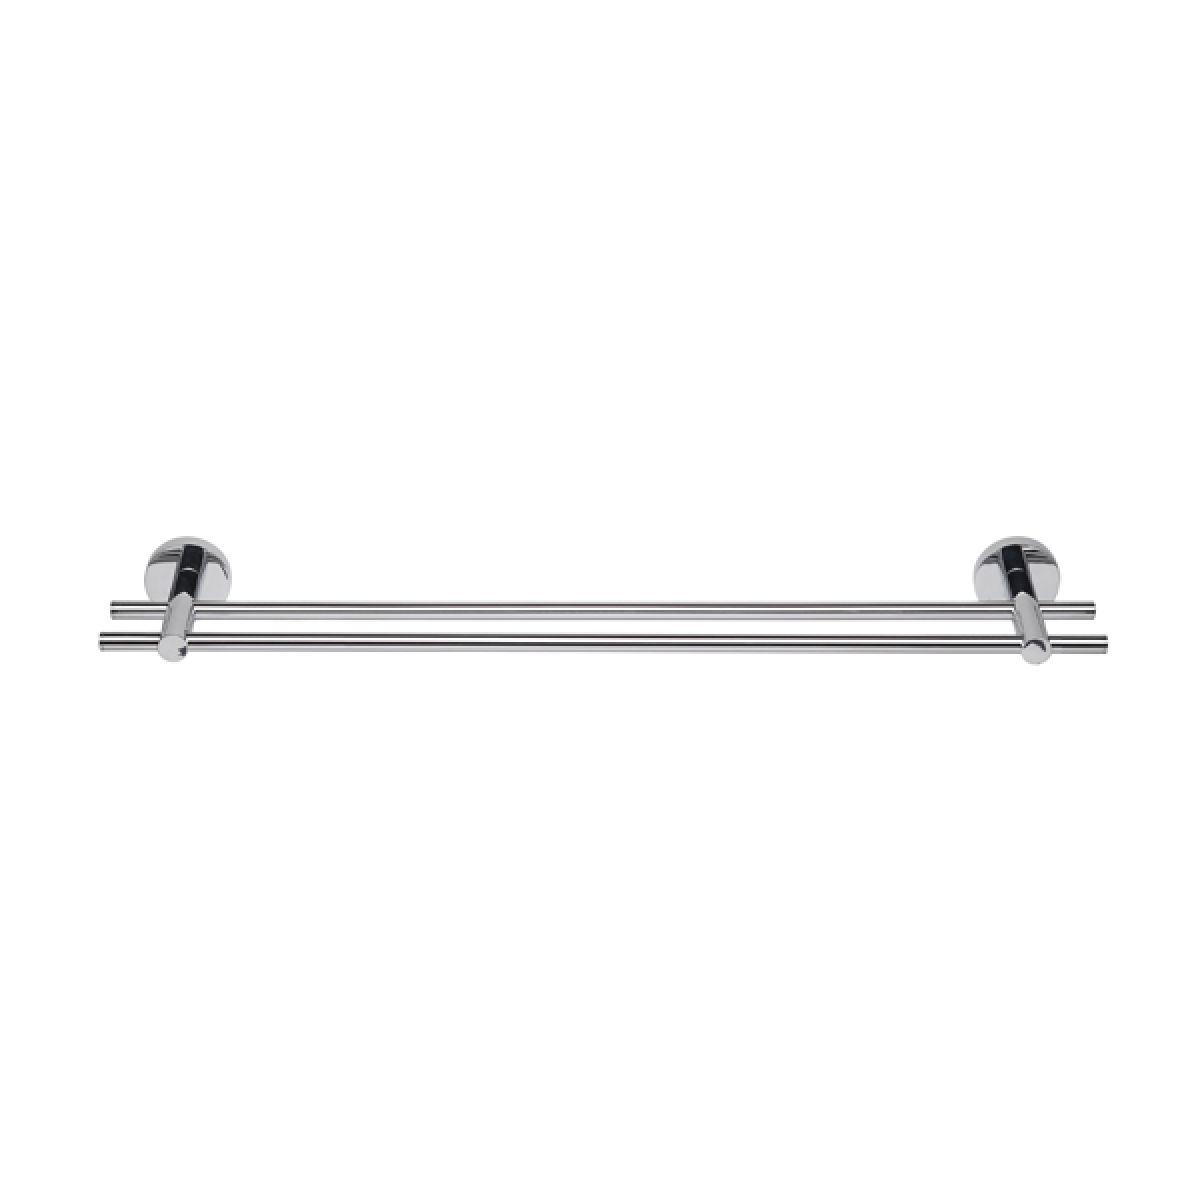 Croydex Professional Medium Double Towel Rail